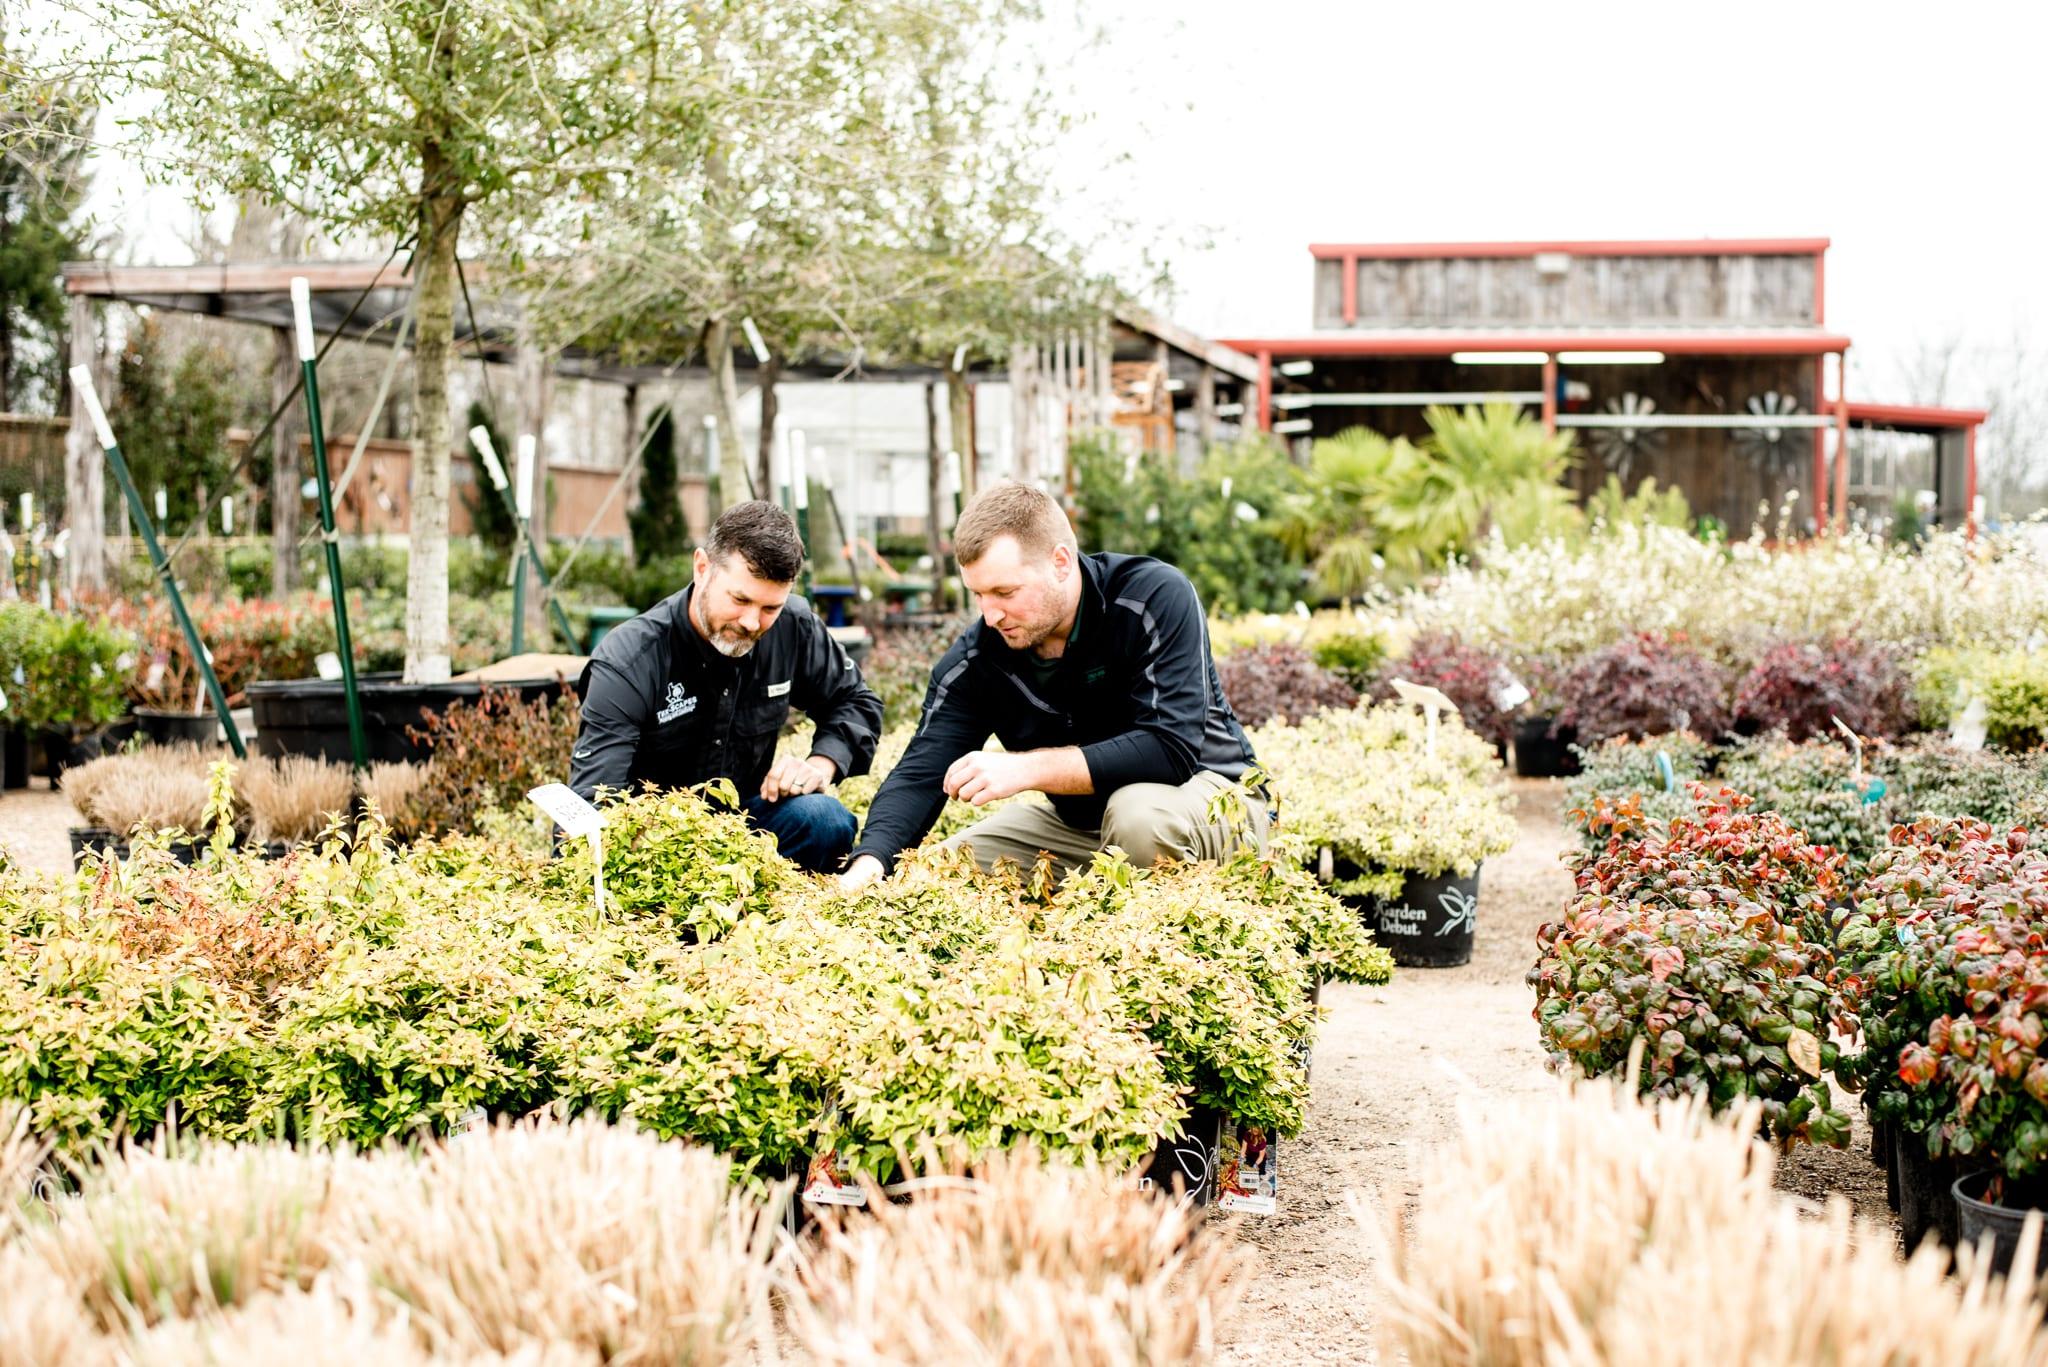 corsicana-texas-professional-landscaping-service